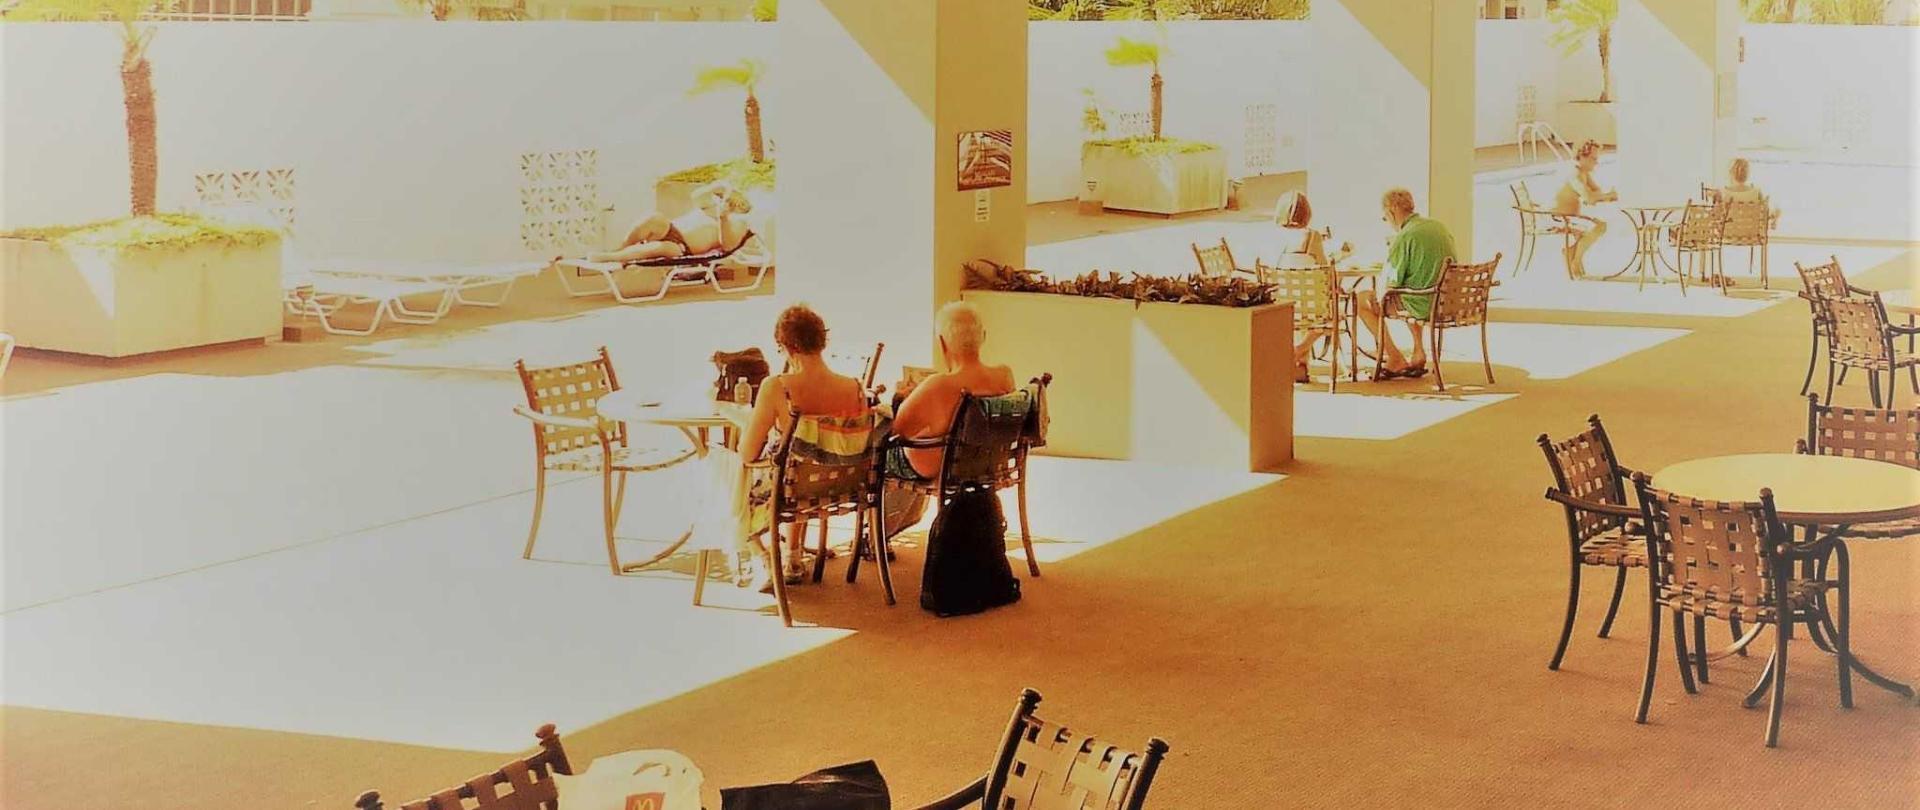 rk-lounge-1.JPG